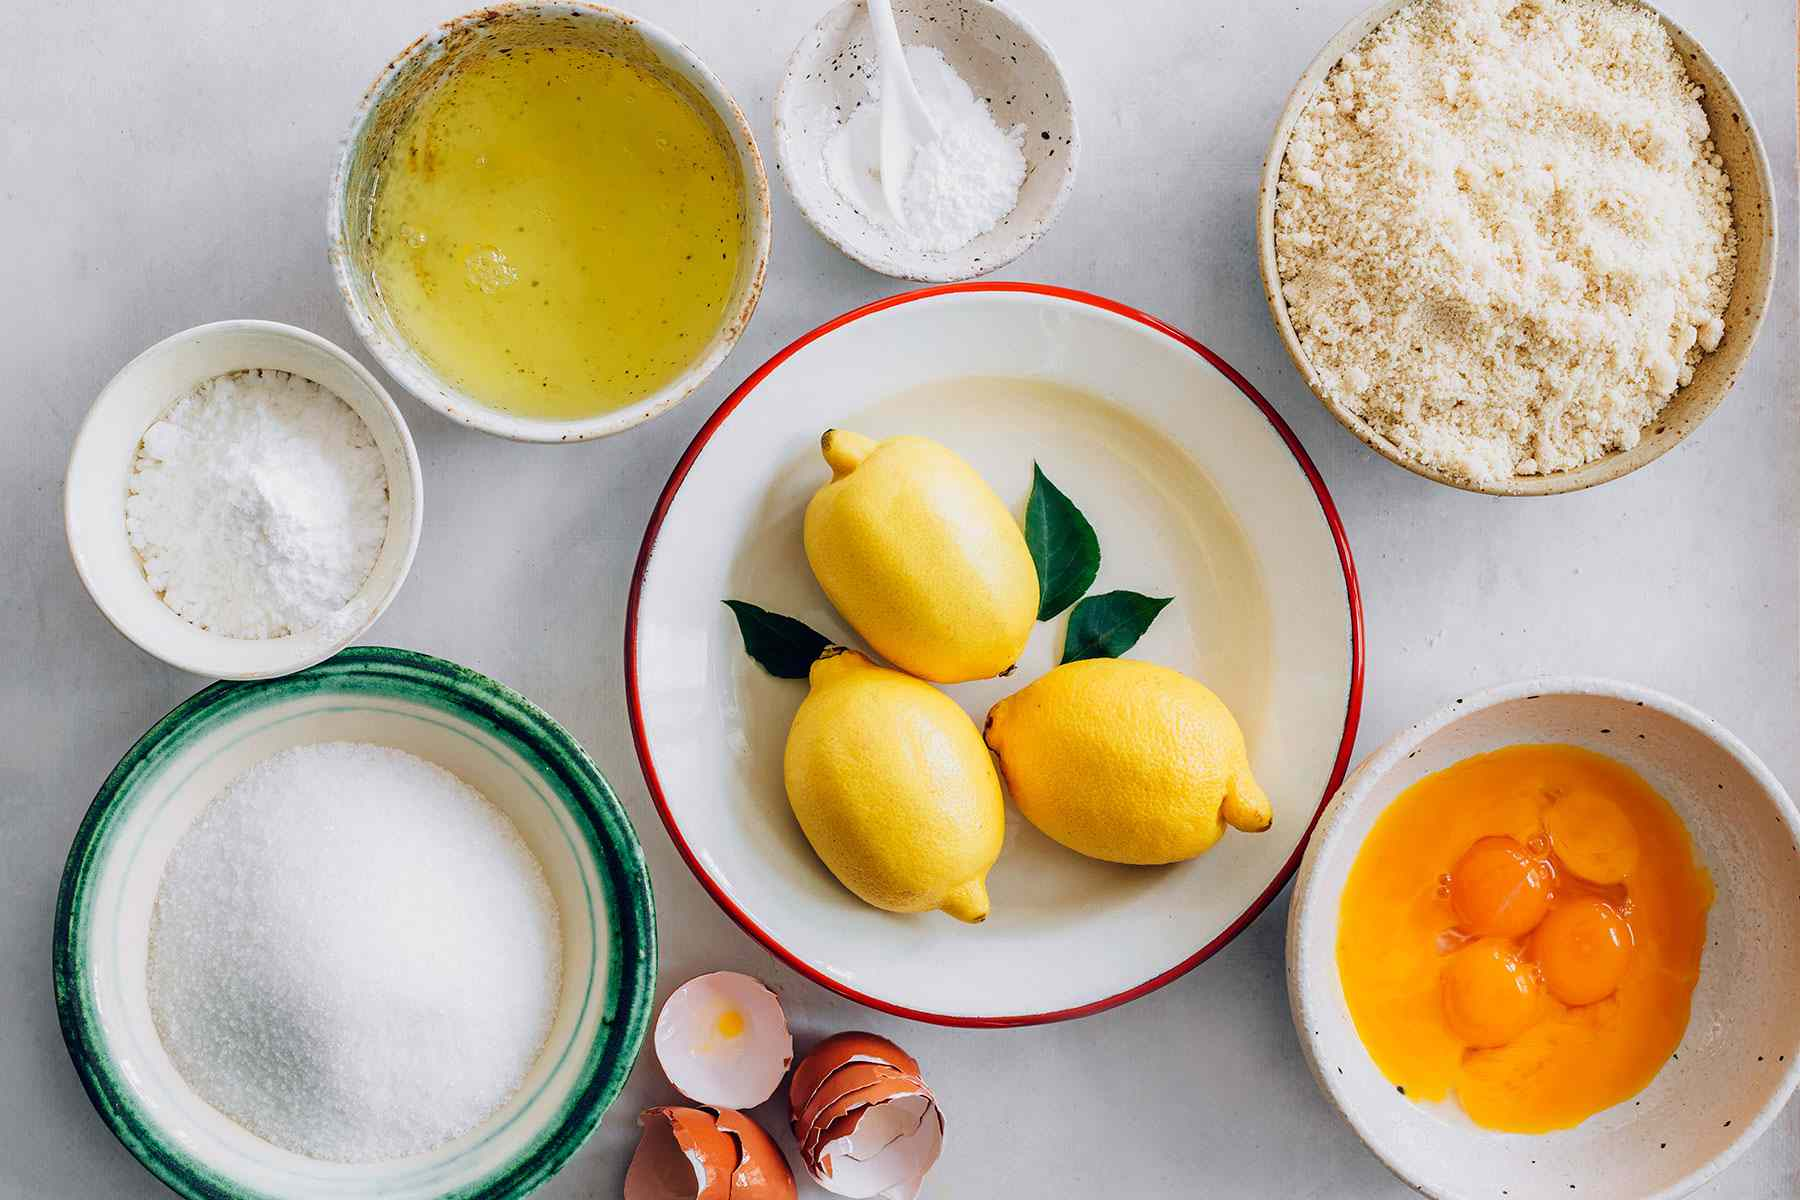 Flourless Italian almond-lemon cake ingredients